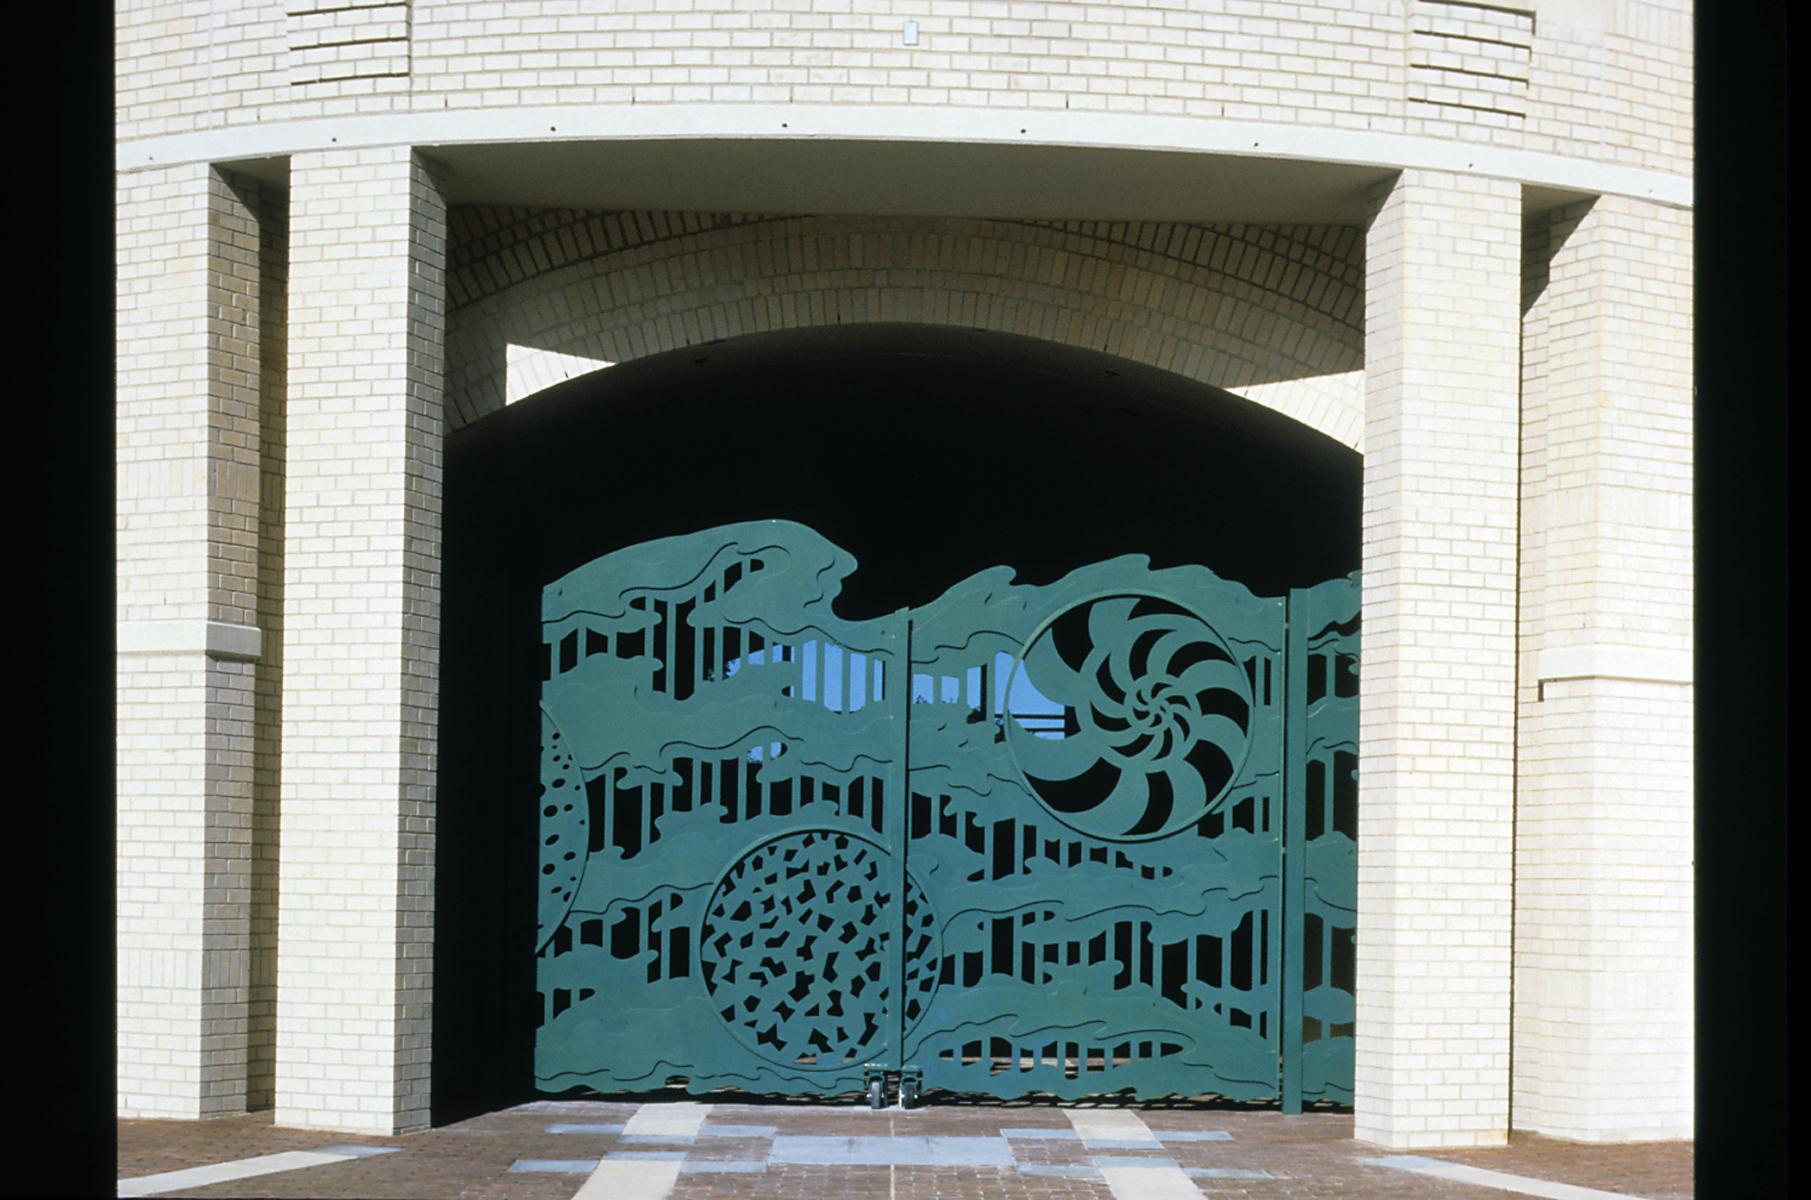 1992, Watermark - gate